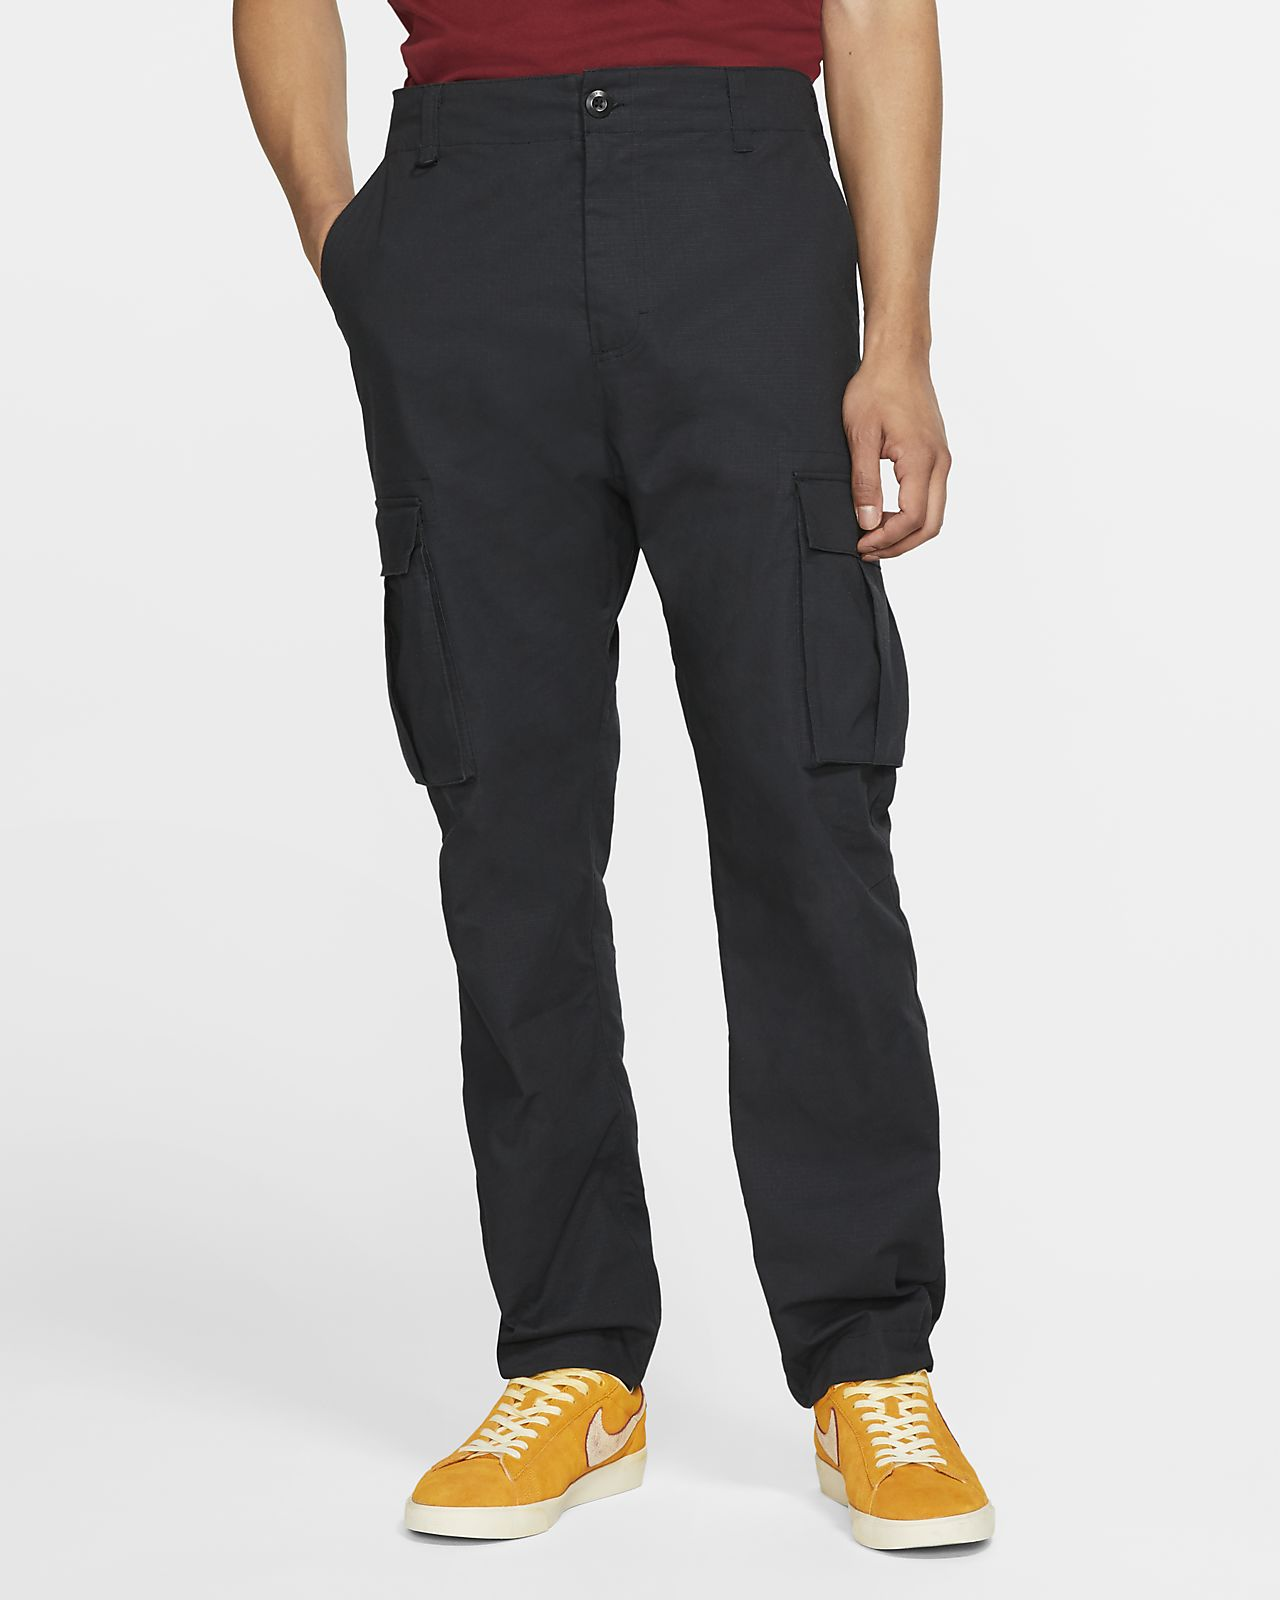 Nike SB Flex FTM Men's Skate Trousers